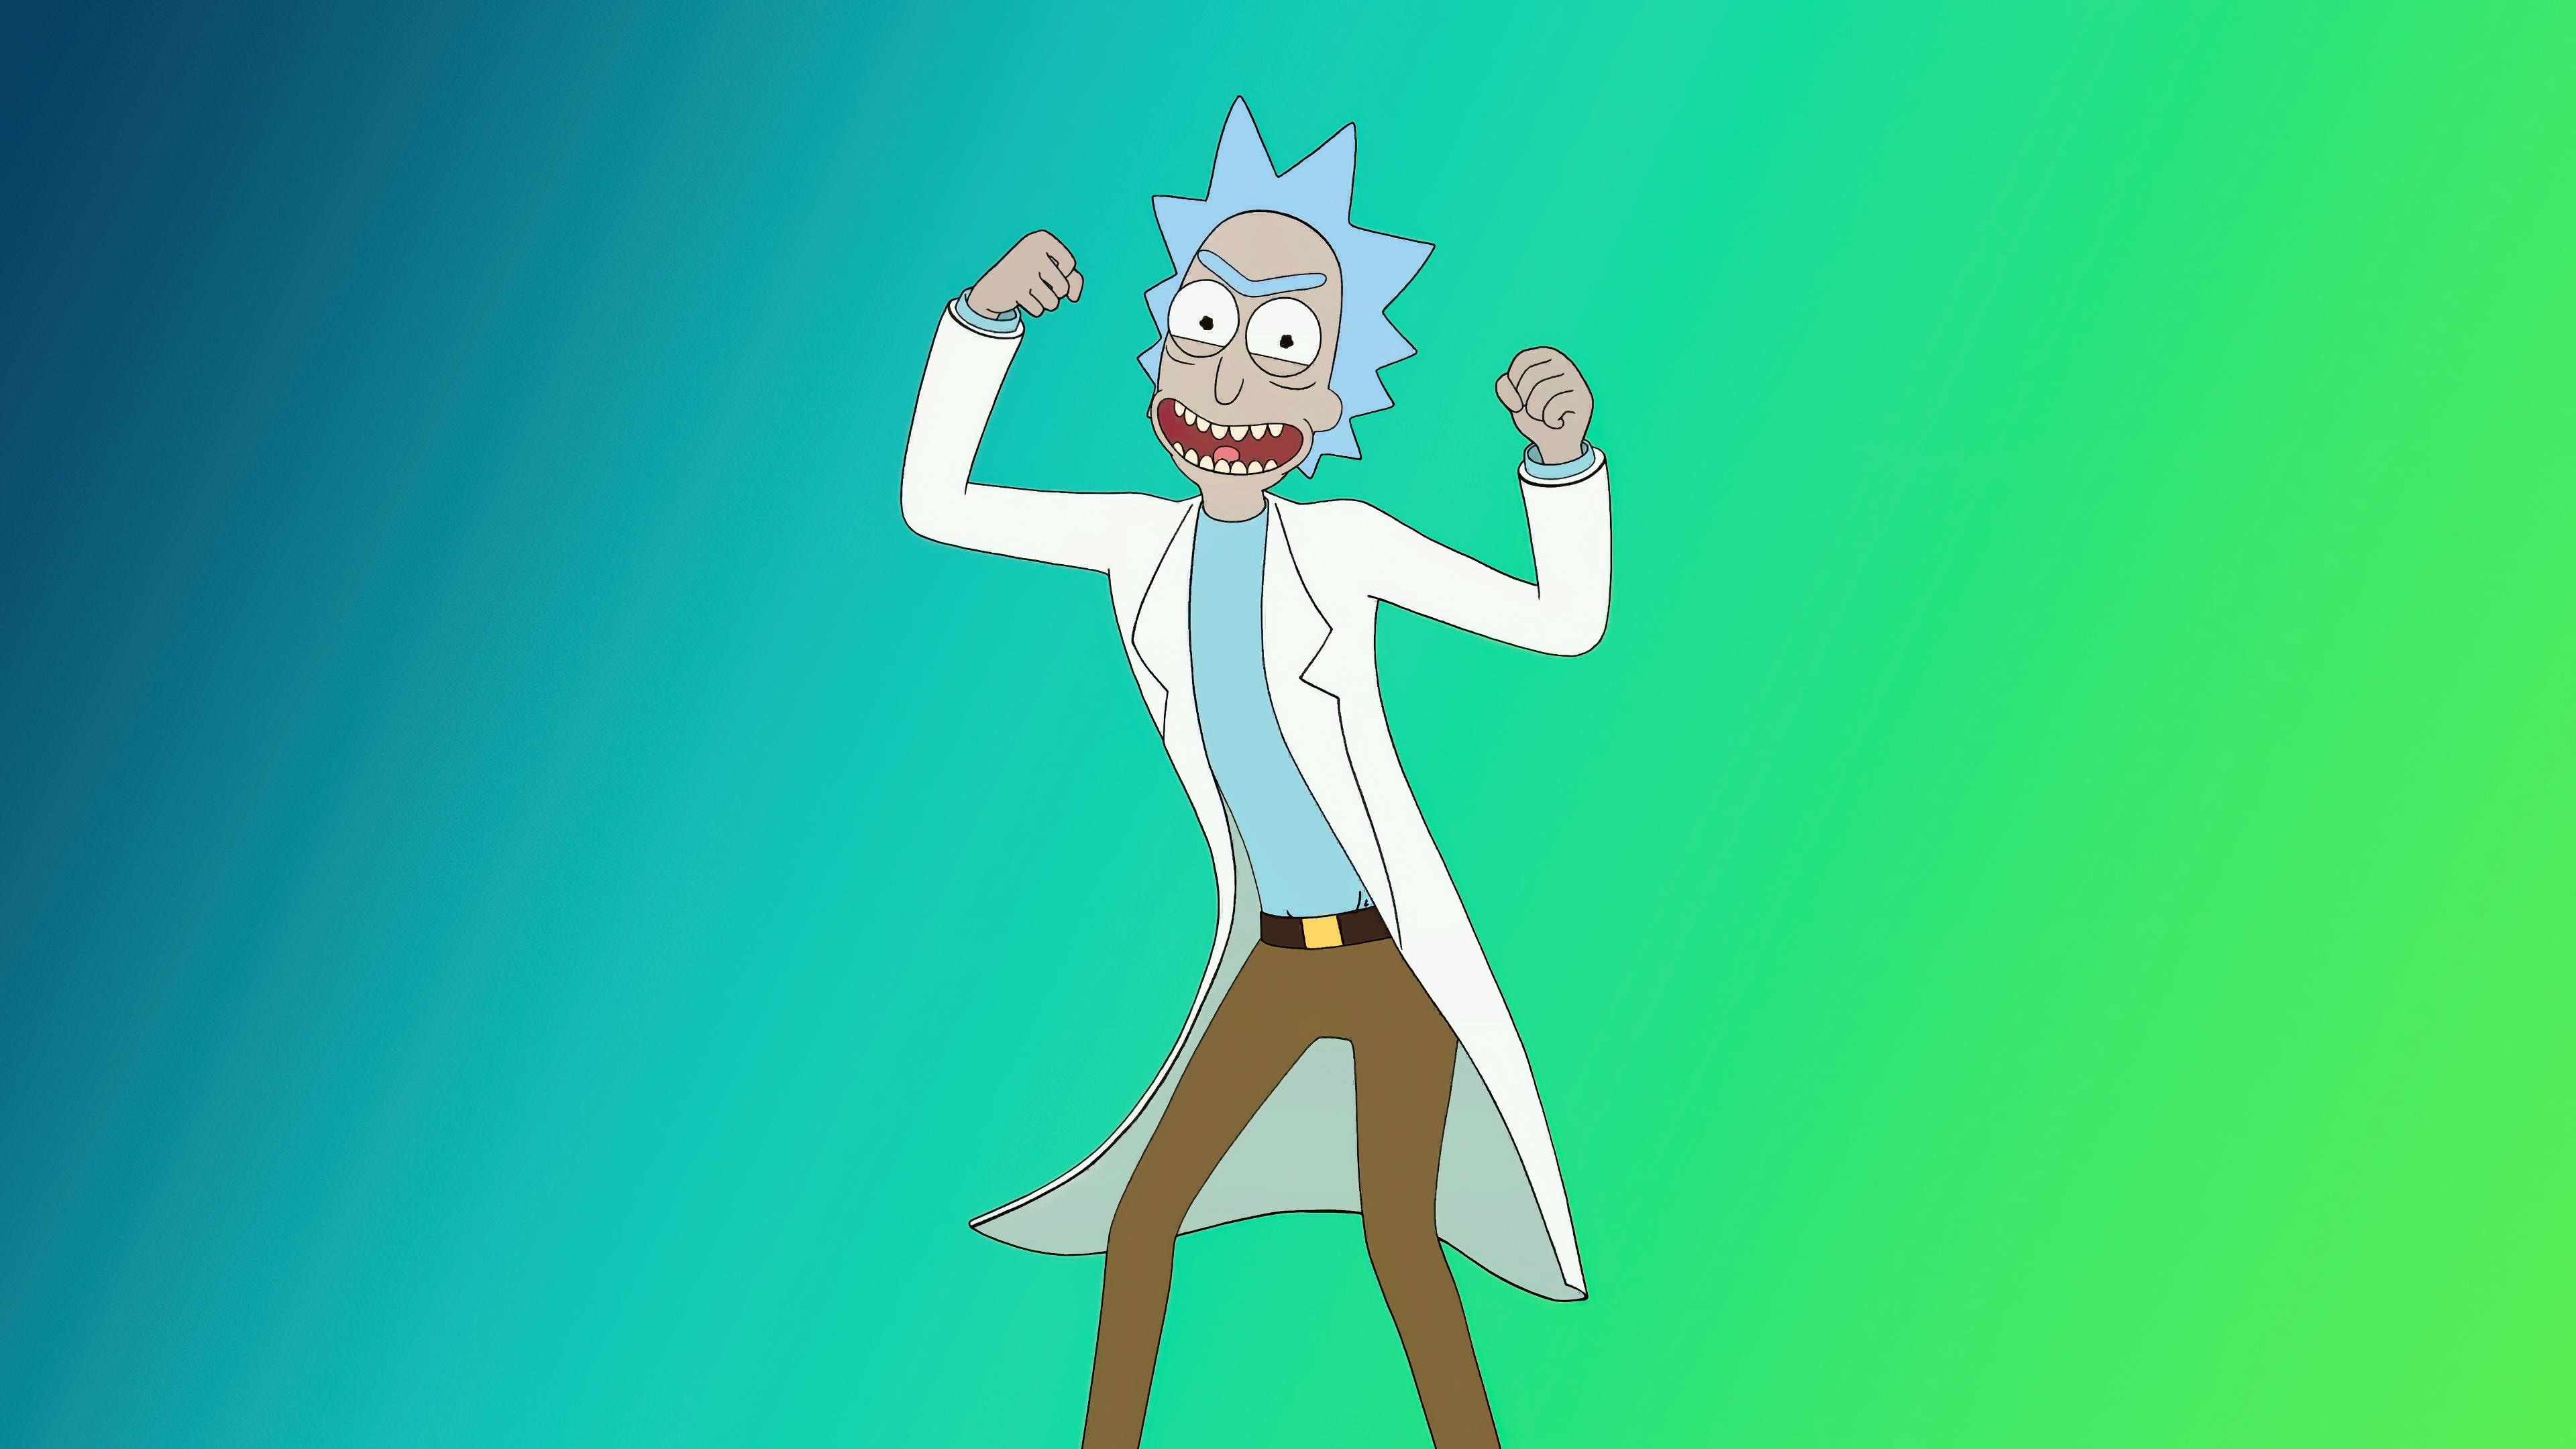 rick and morty season 5 4k 1627769779 - Rick And Morty Season 5 4k - Rick And Morty Season 5 4k wallpapers